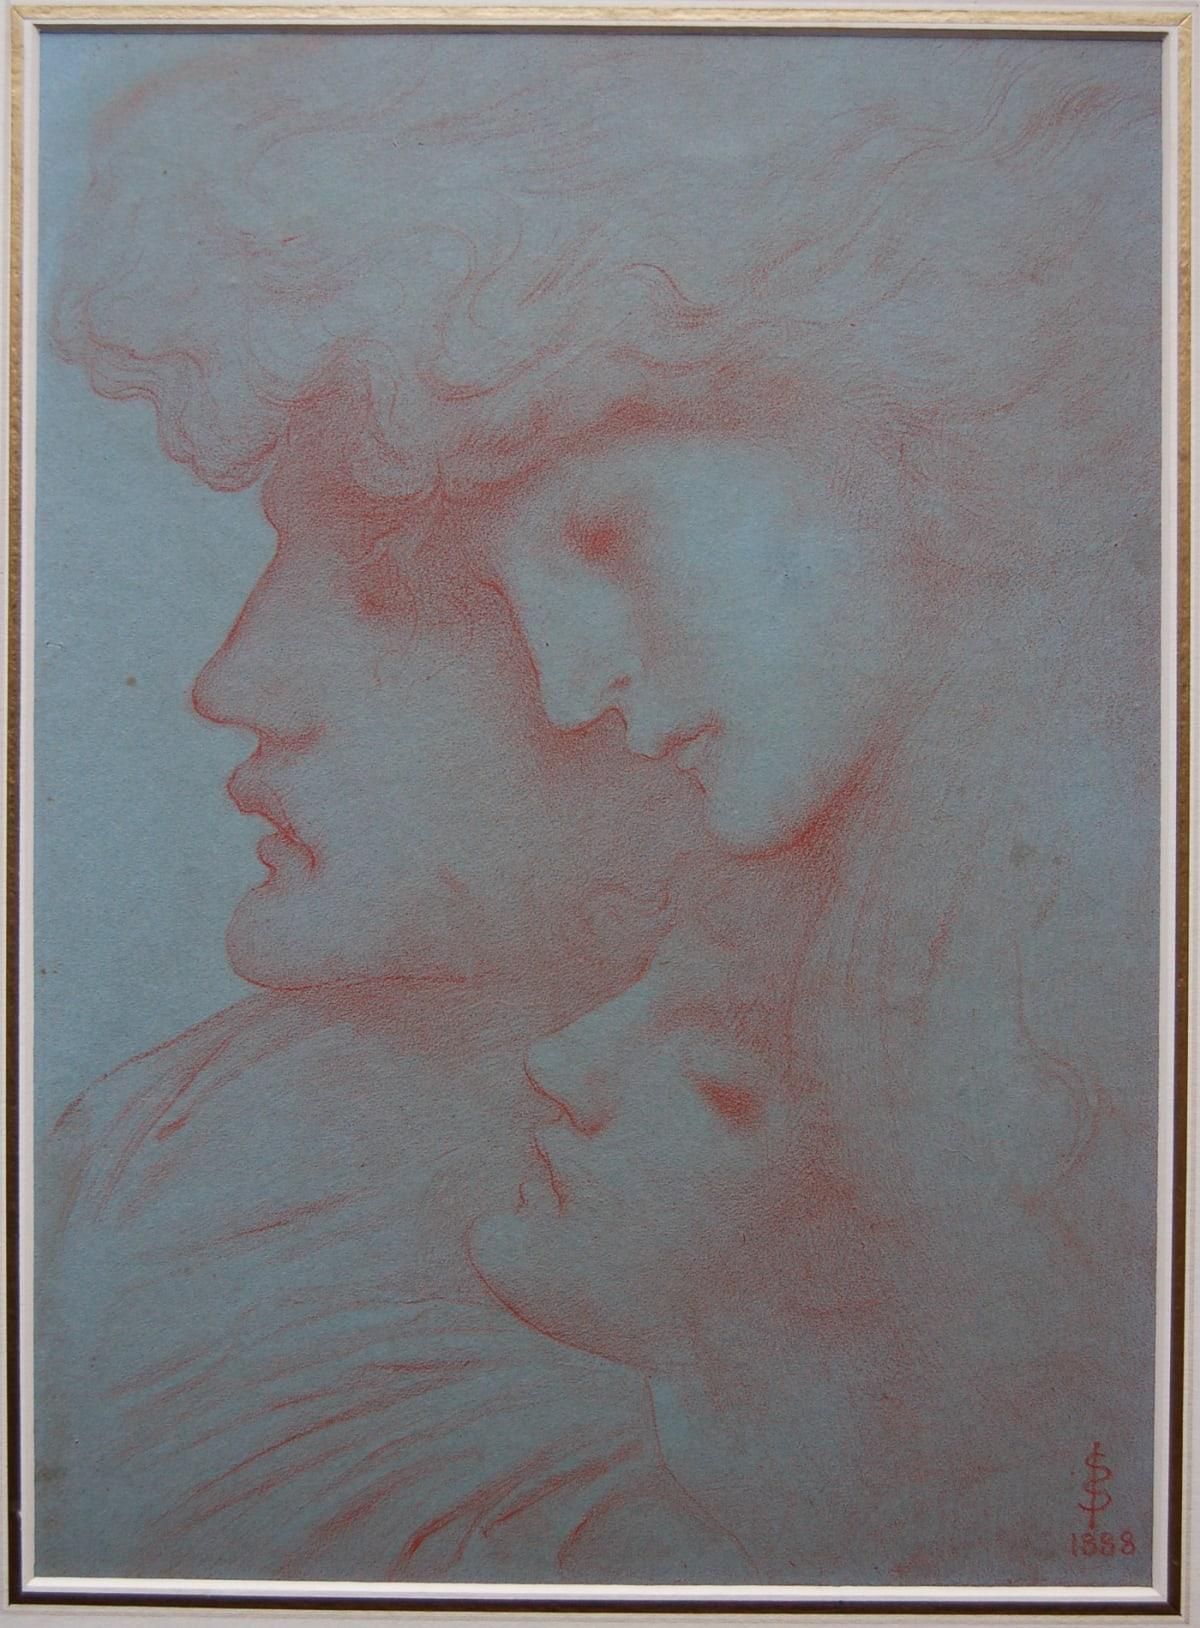 Simeon Solomon 'Sleep' Red chalk on blue paper, 1888 SOLD